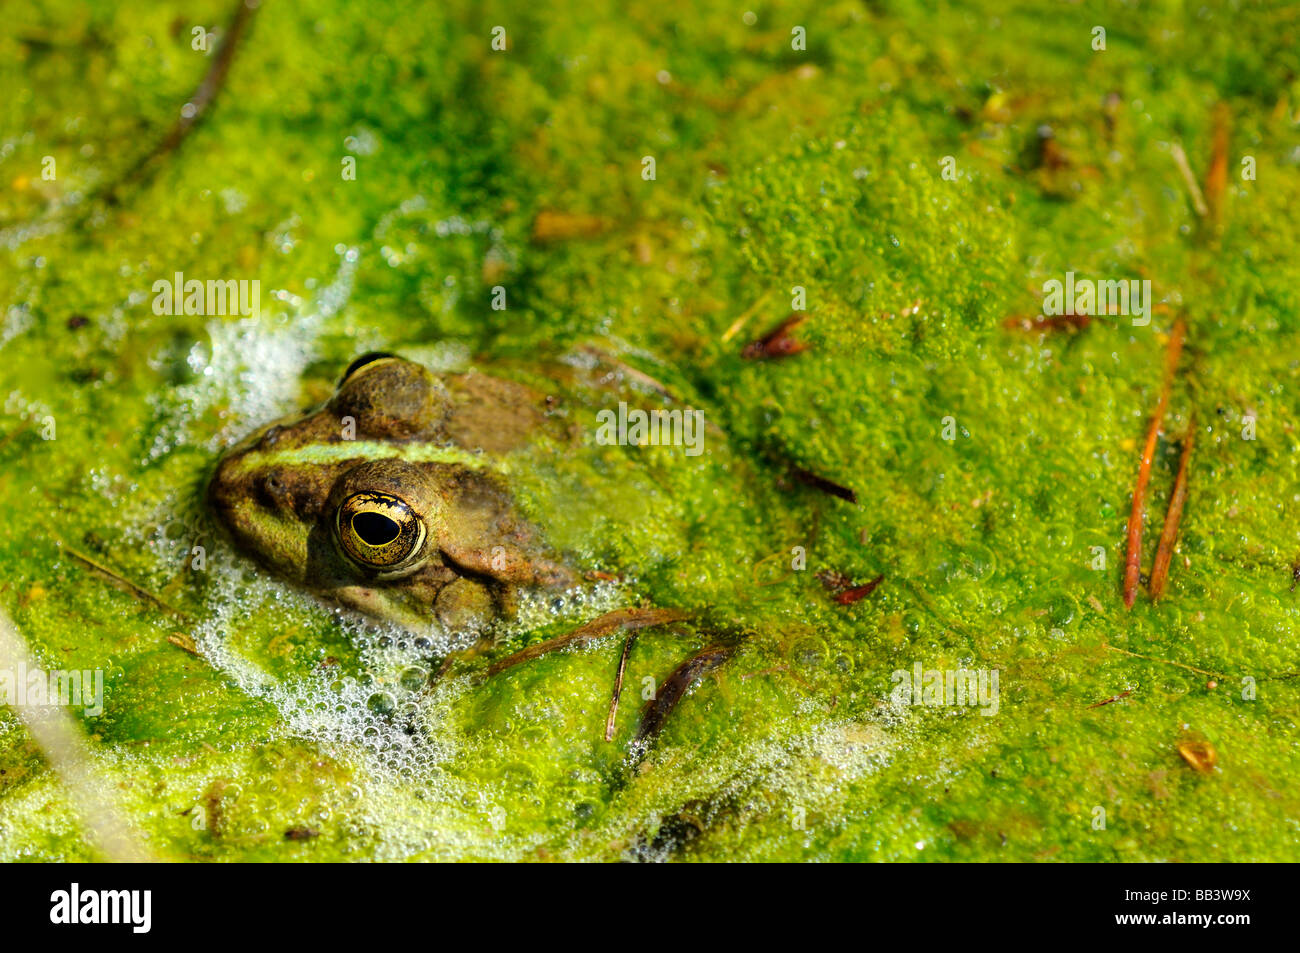 Edible frog, Water frog, Rana kl esculenta - Stock Image